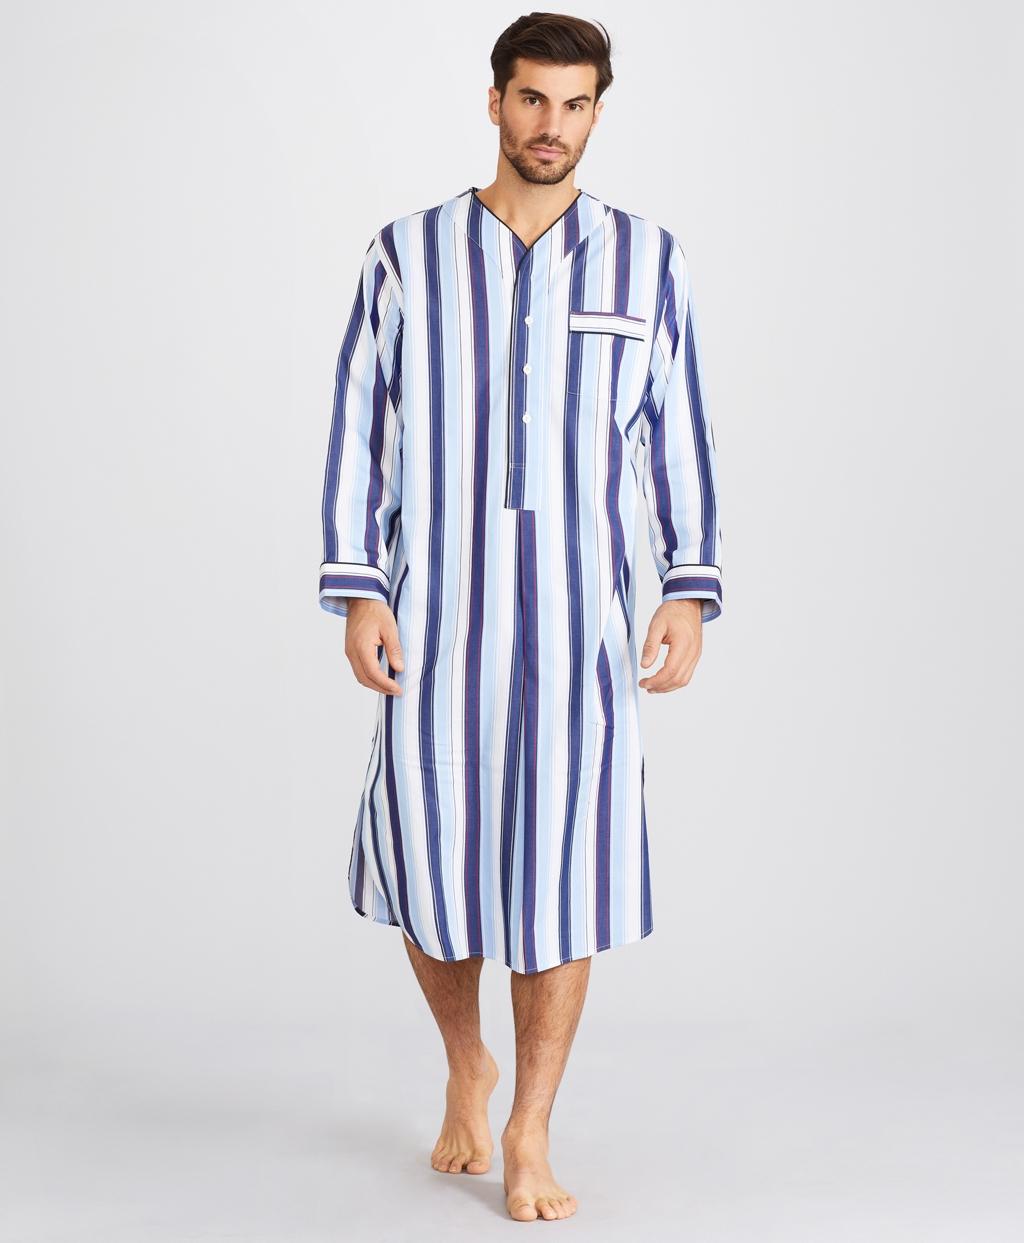 1940s Men's Underwear: Briefs, Boxers, Unions, & Socks Brooks Brothers Mens Bold Stripe Nightshirt $79.50 AT vintagedancer.com